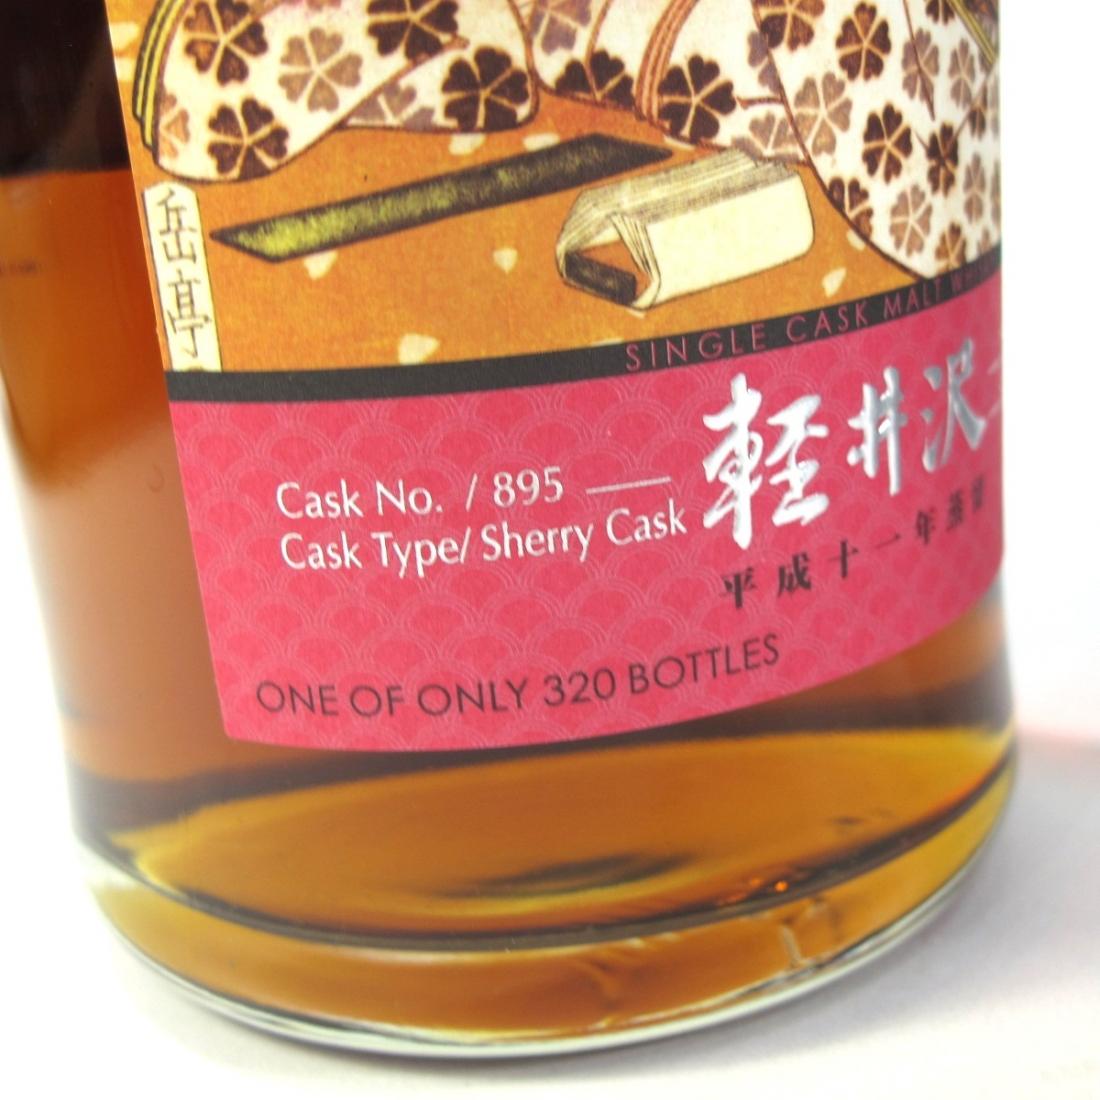 Karuizawa 1999 Single Cask #895 / Geisha Label